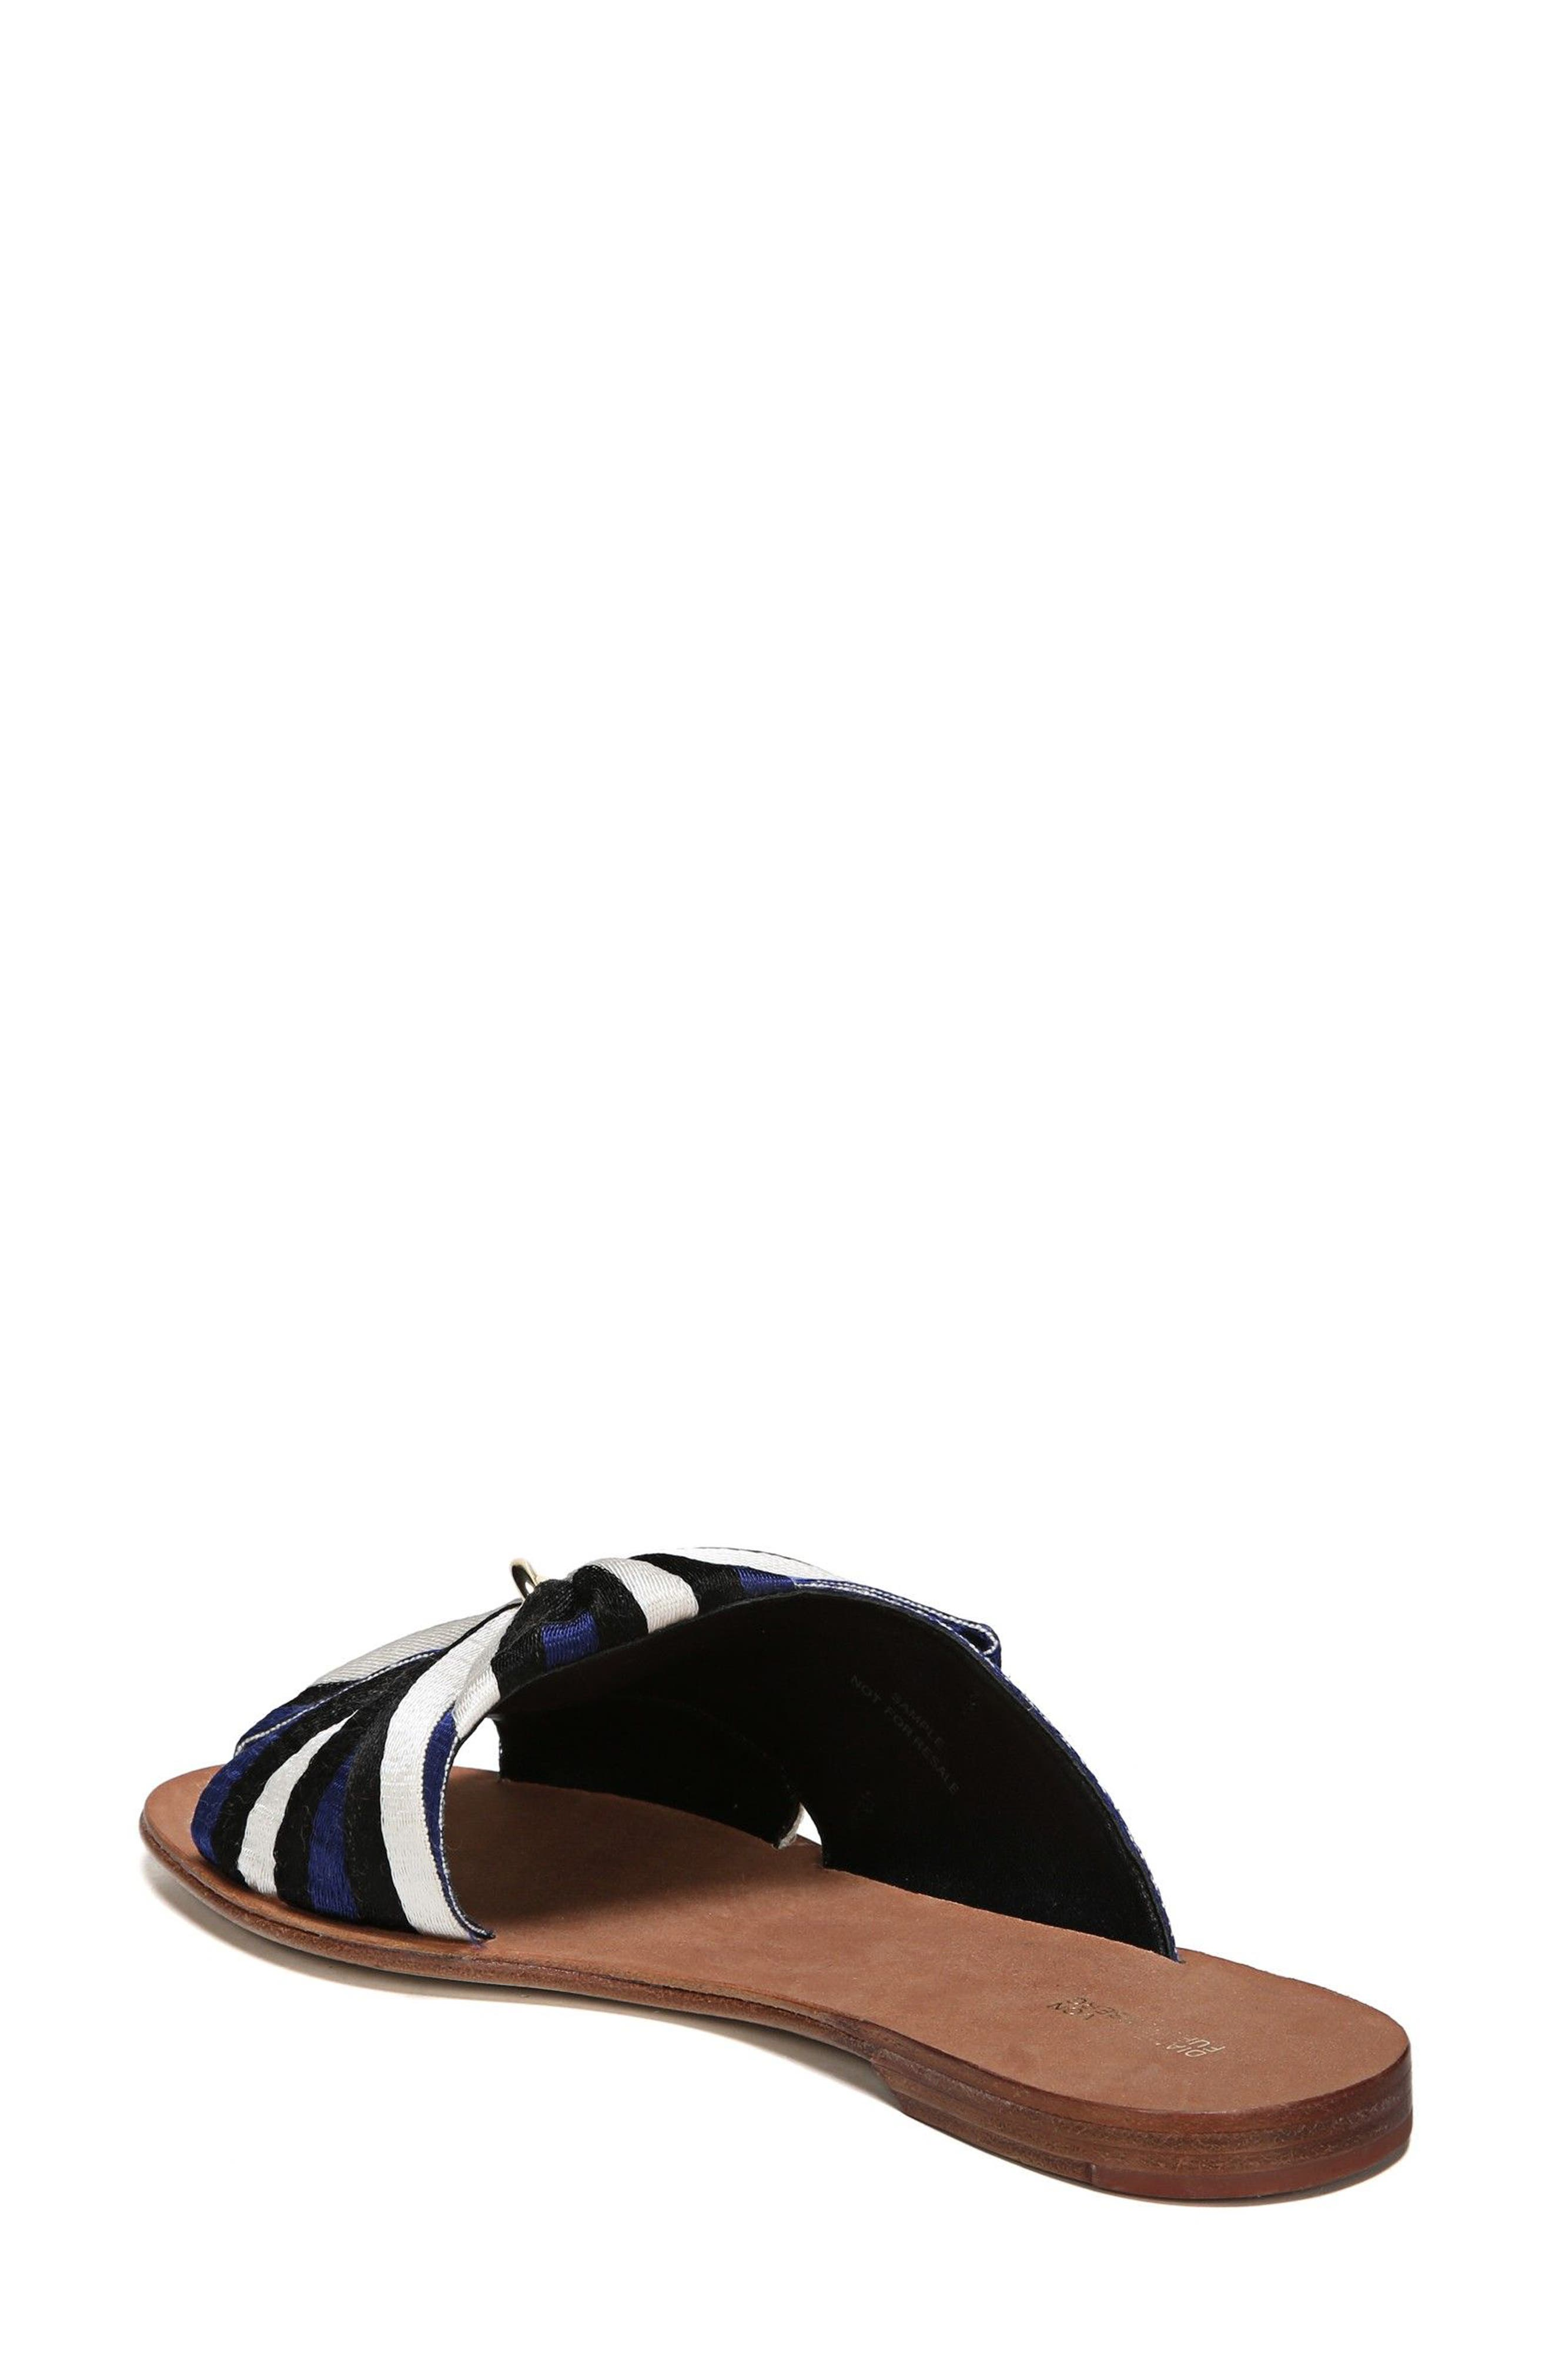 Bella Asymmetrical Slide Sandal,                             Alternate thumbnail 2, color,                             400